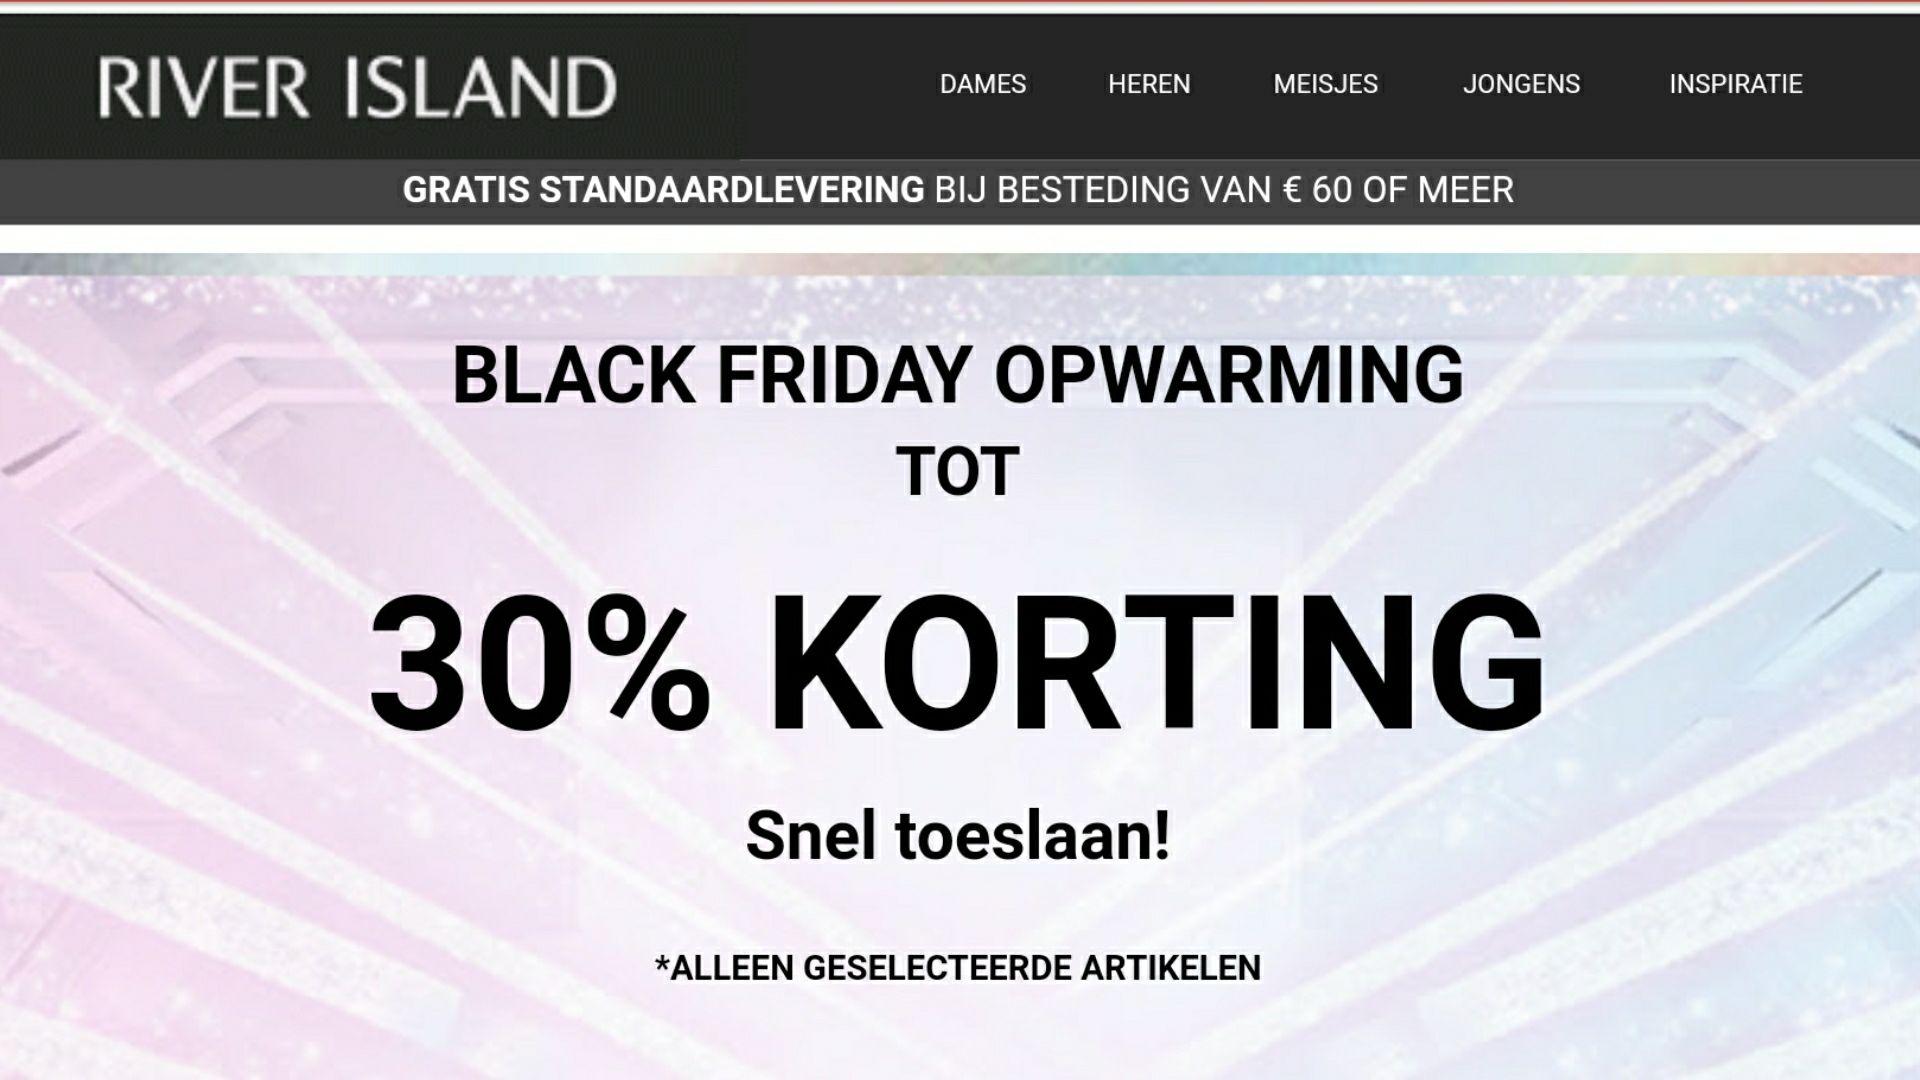 Black Friday Opwarming. Tot 30% korting bij River Island.